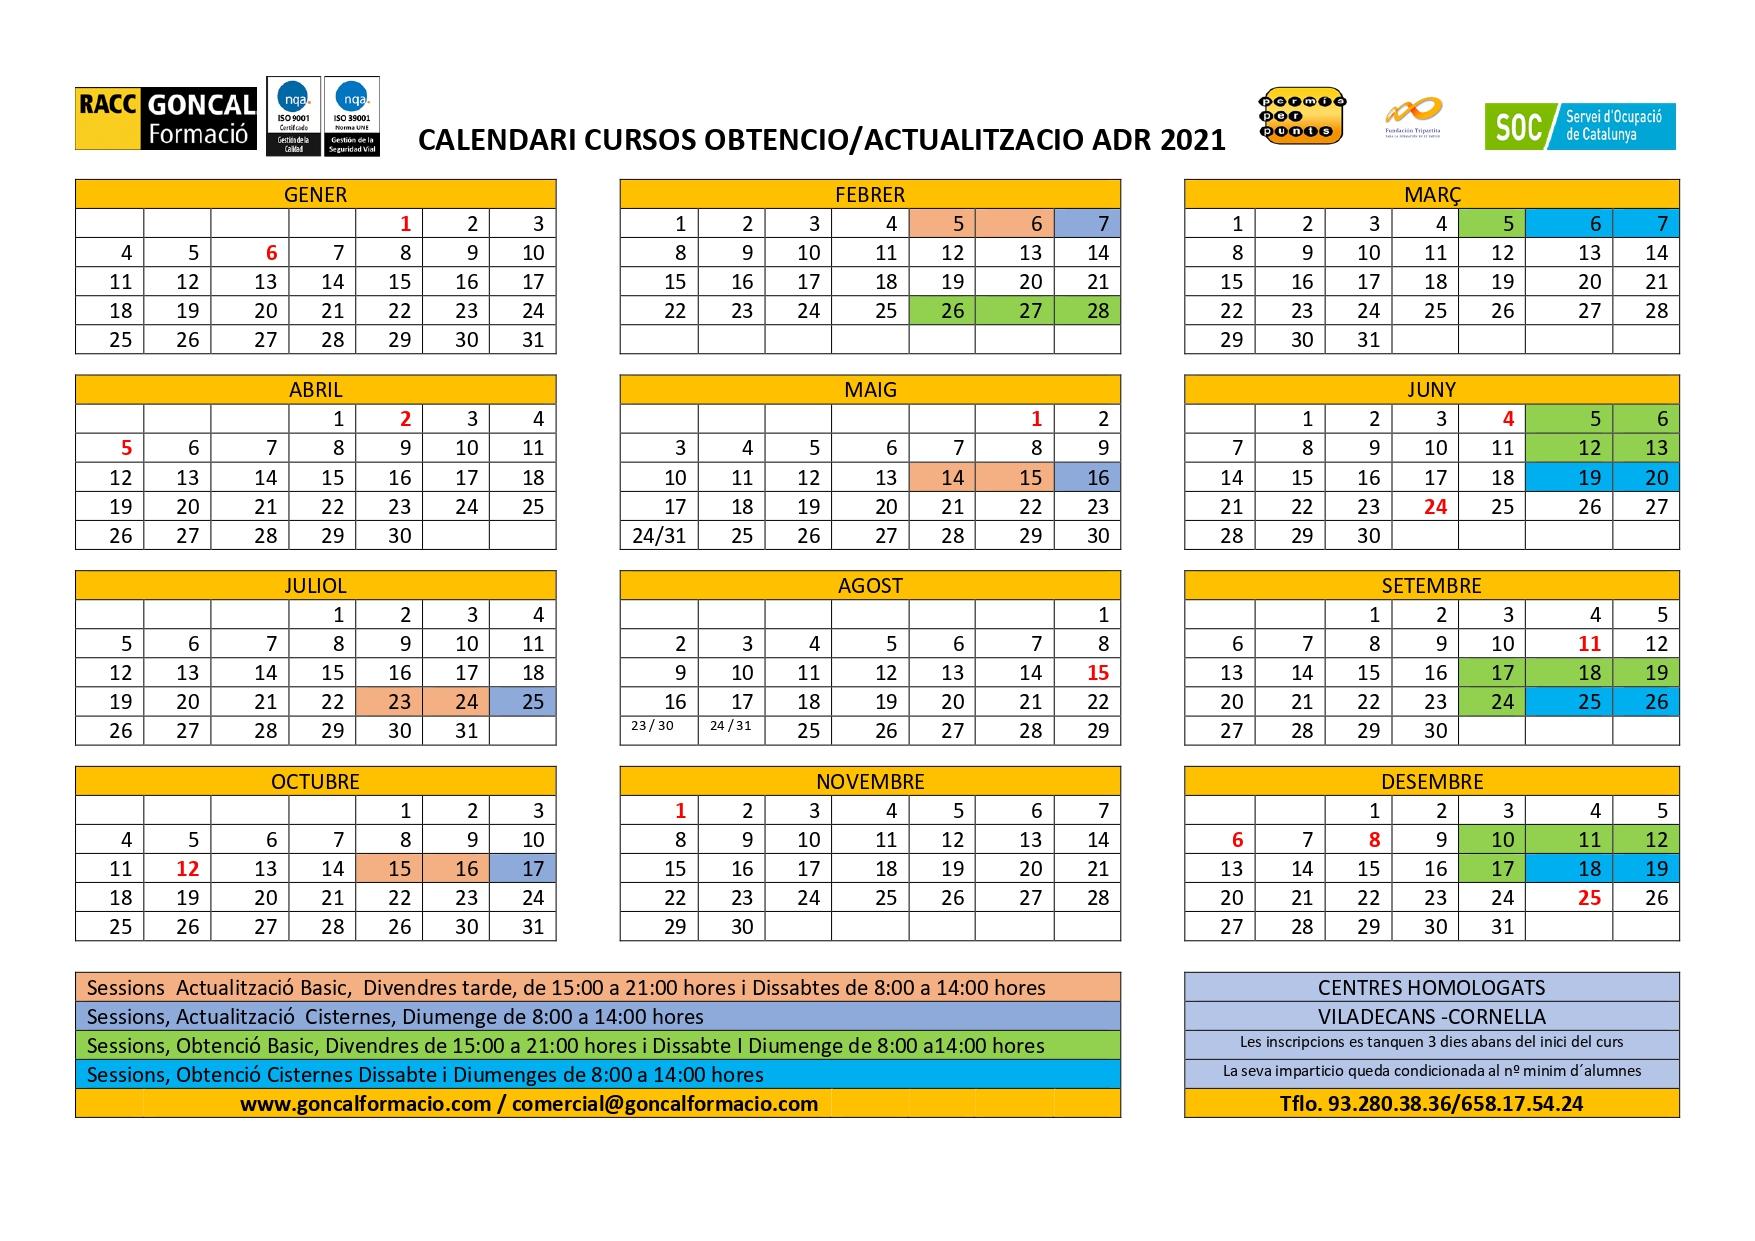 ADR calendari 2021 maig